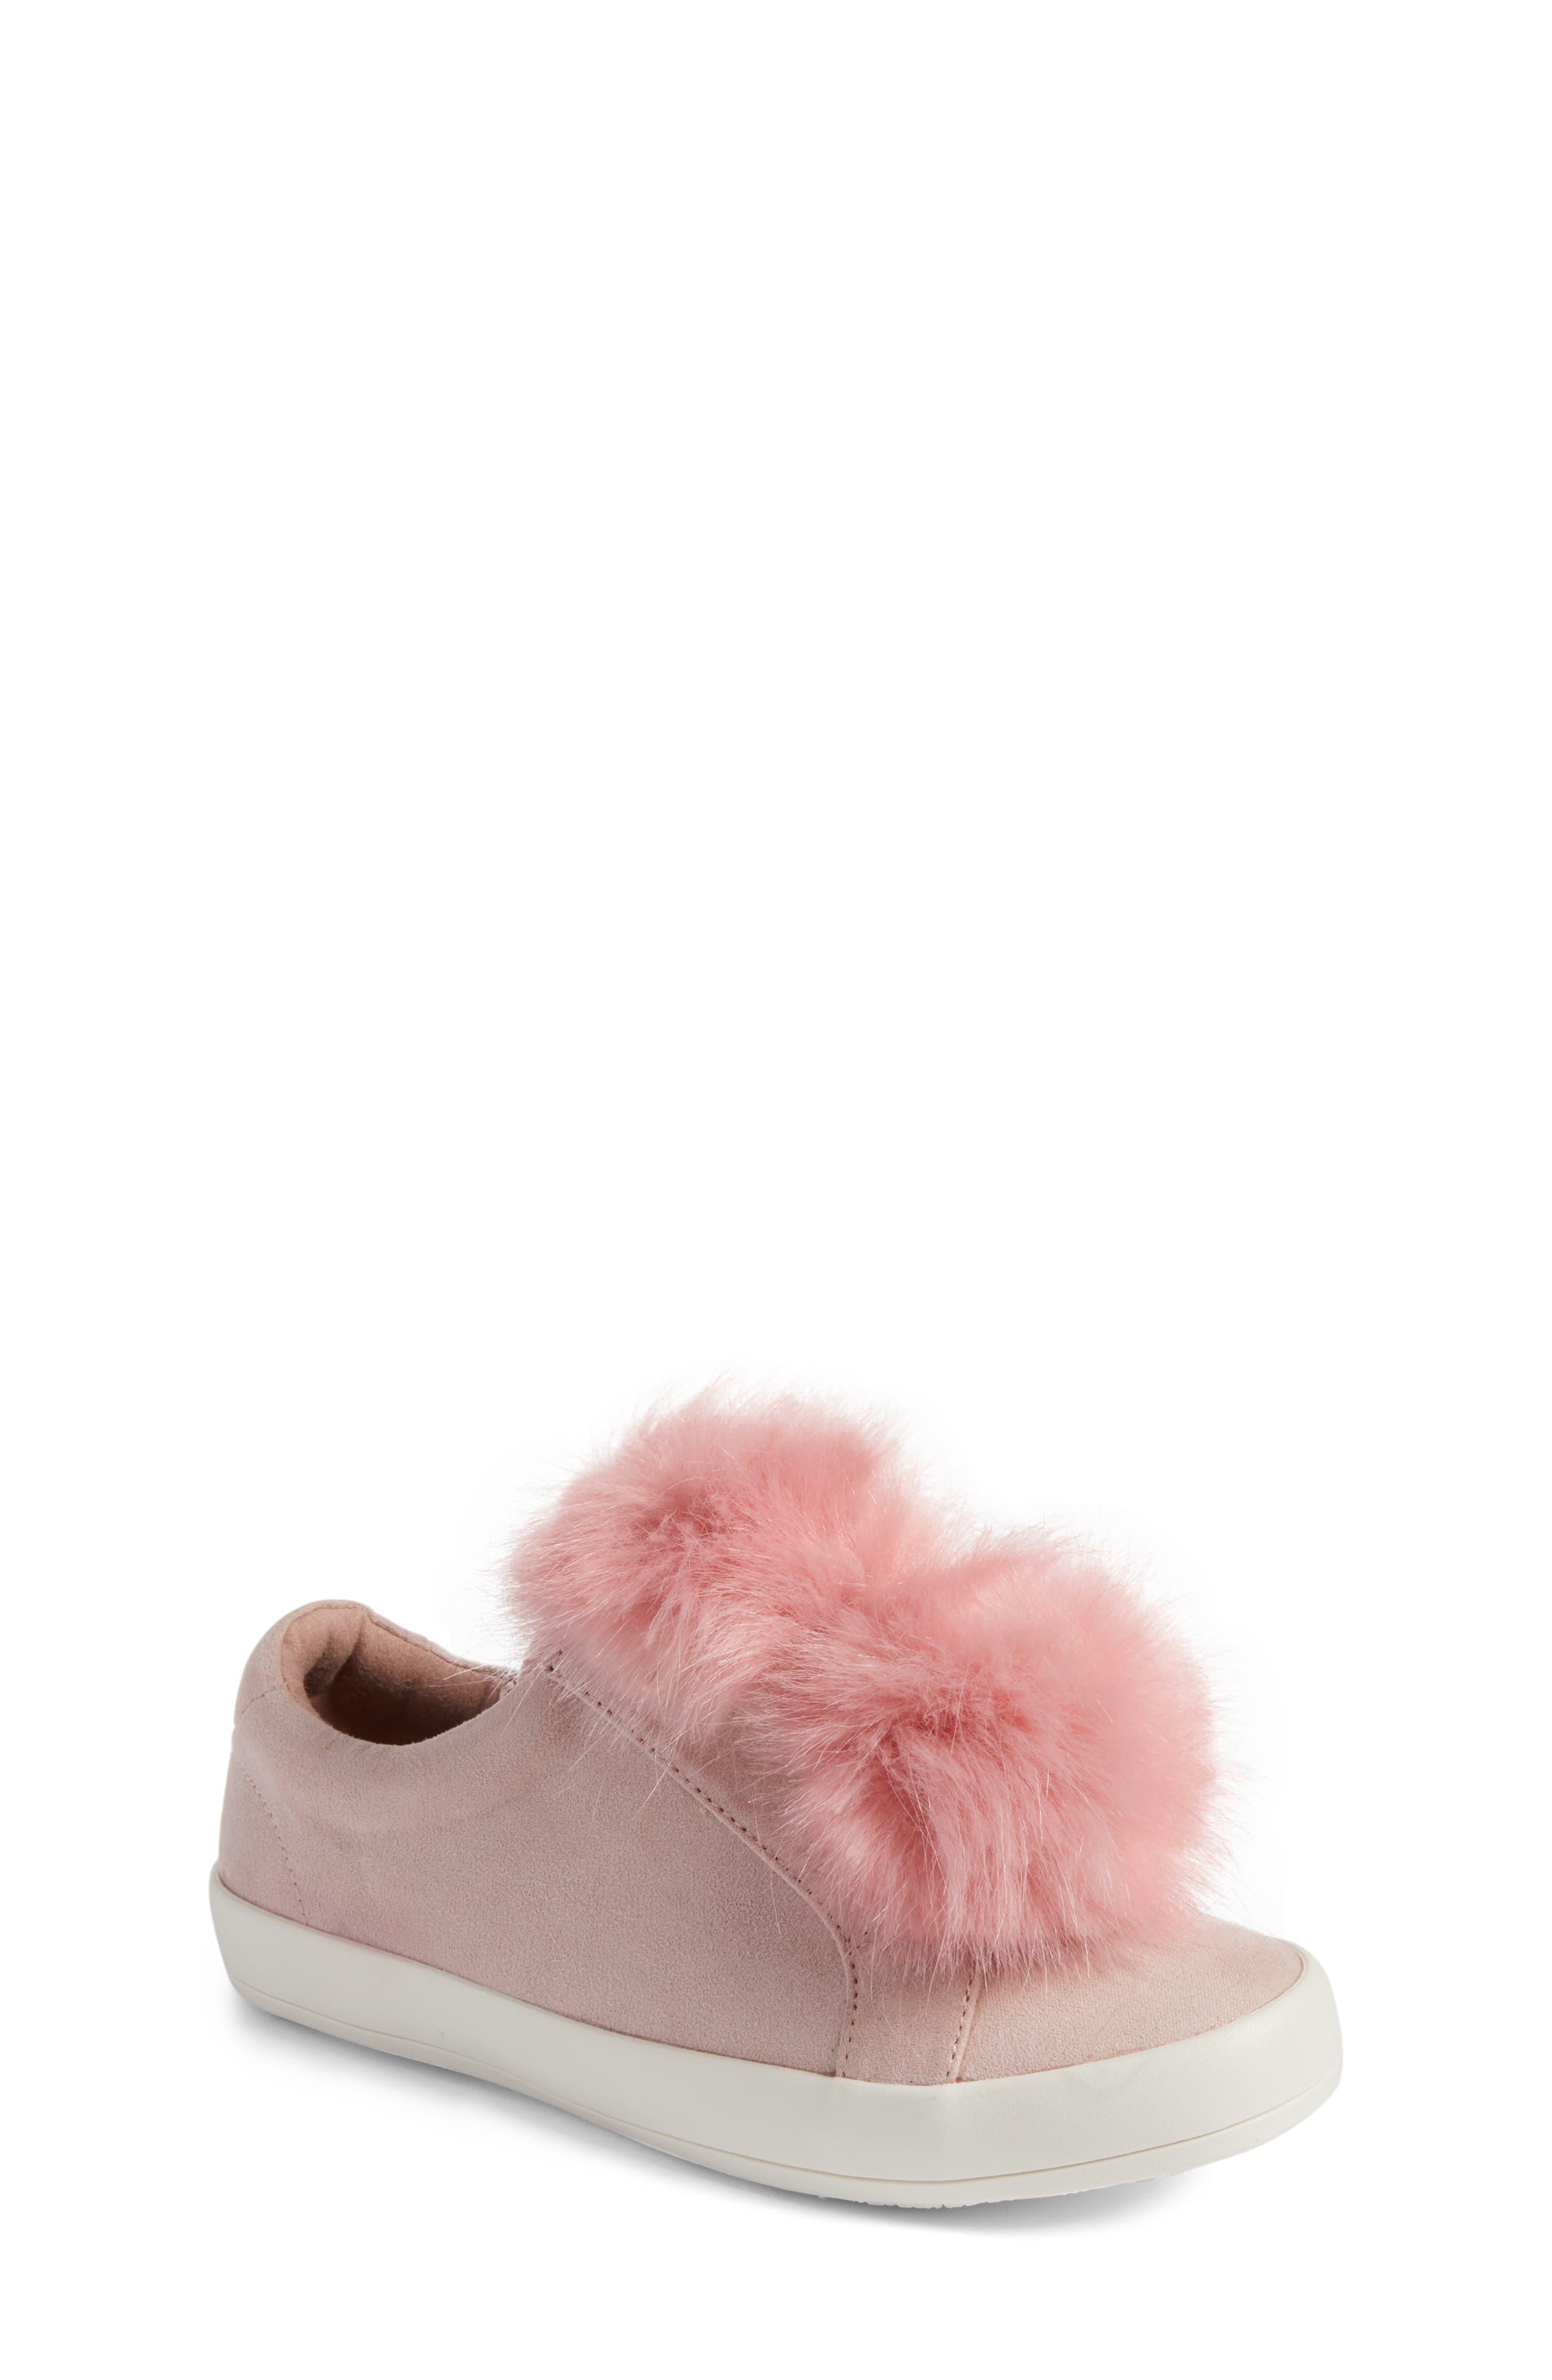 Main Image - Sam Edelman Cynthia Leya Faux Fur Pompom Slip-On Sneaker (Toddler, Little Kid & Big Kid)